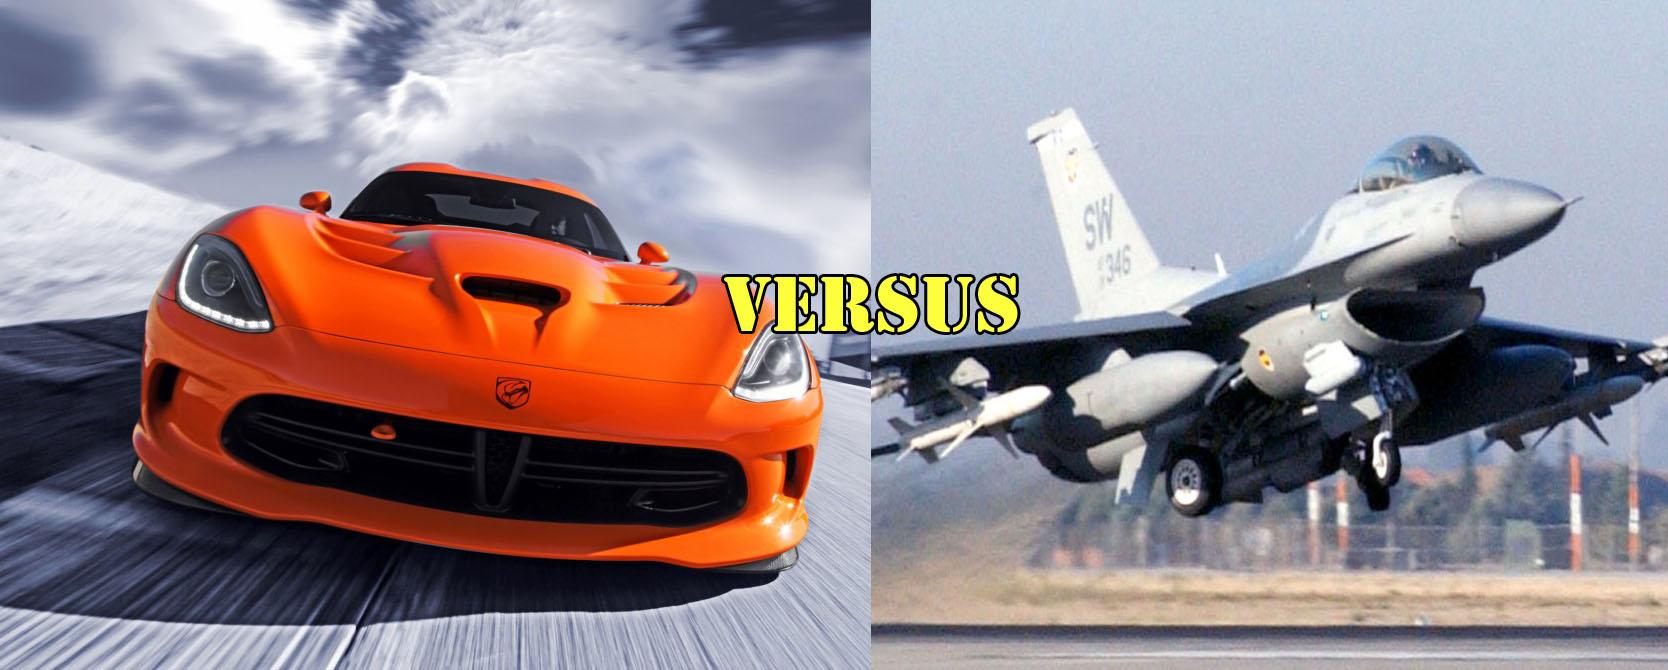 Srt Viper Races F 16 Viper Fighter Jet Video